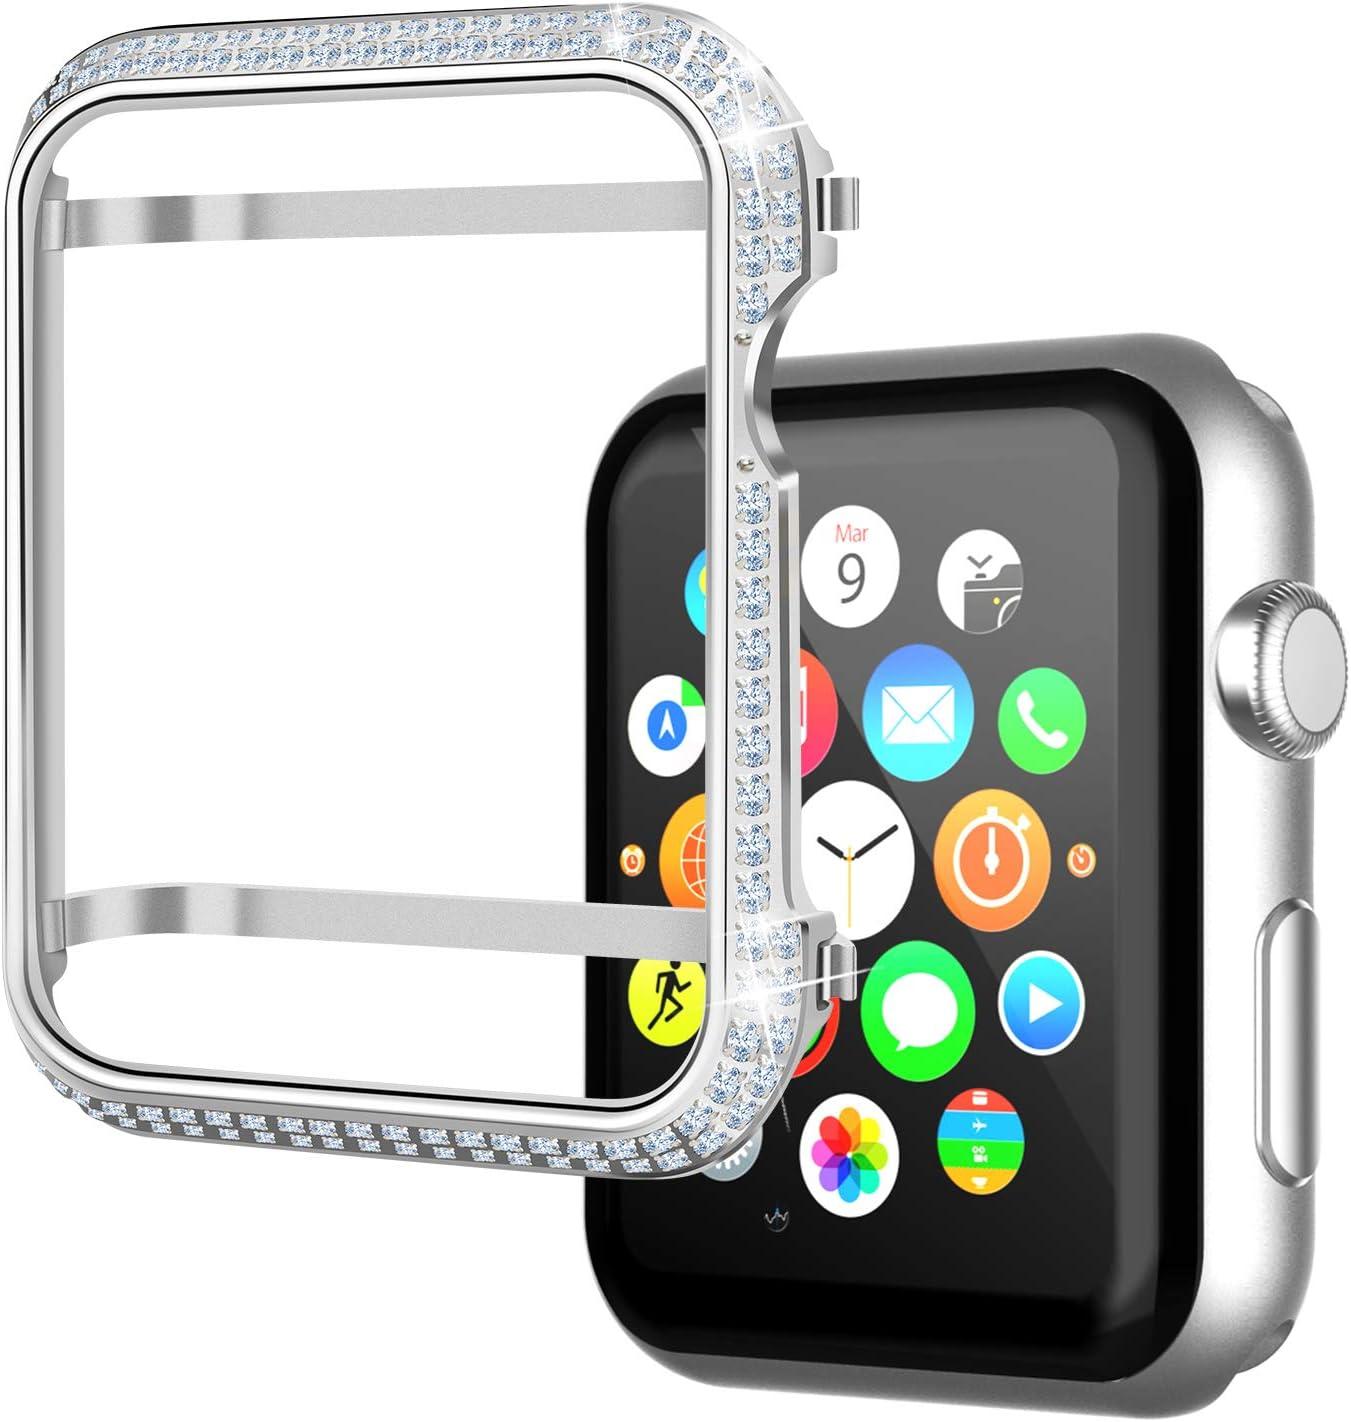 Srotek Diamond Watch Case Handcrafted Zircon Watch Bumper Gold-Plated 44mm Watch Bezel Cover Compatible with Apple Watch Series 4 for Men/Women (44mm,Silver)